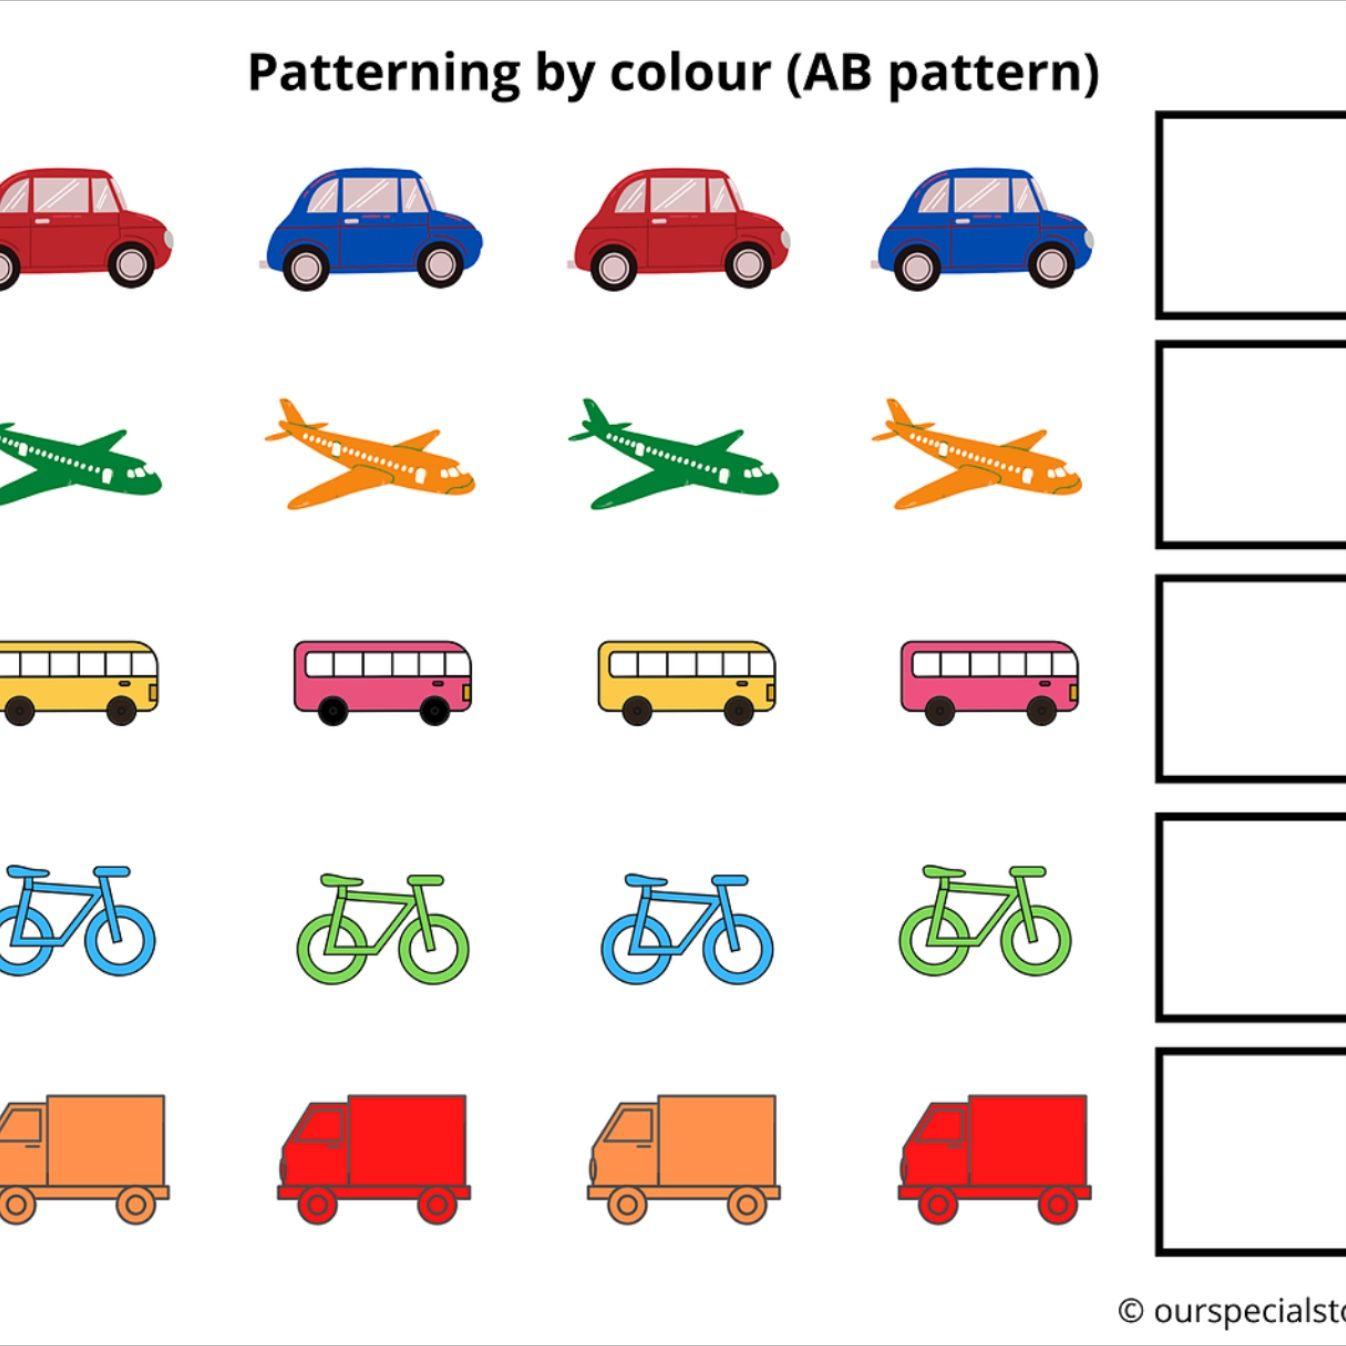 Patterning With Vehicles Abb Patterns Pattern Cool Patterns [ 1346 x 1346 Pixel ]